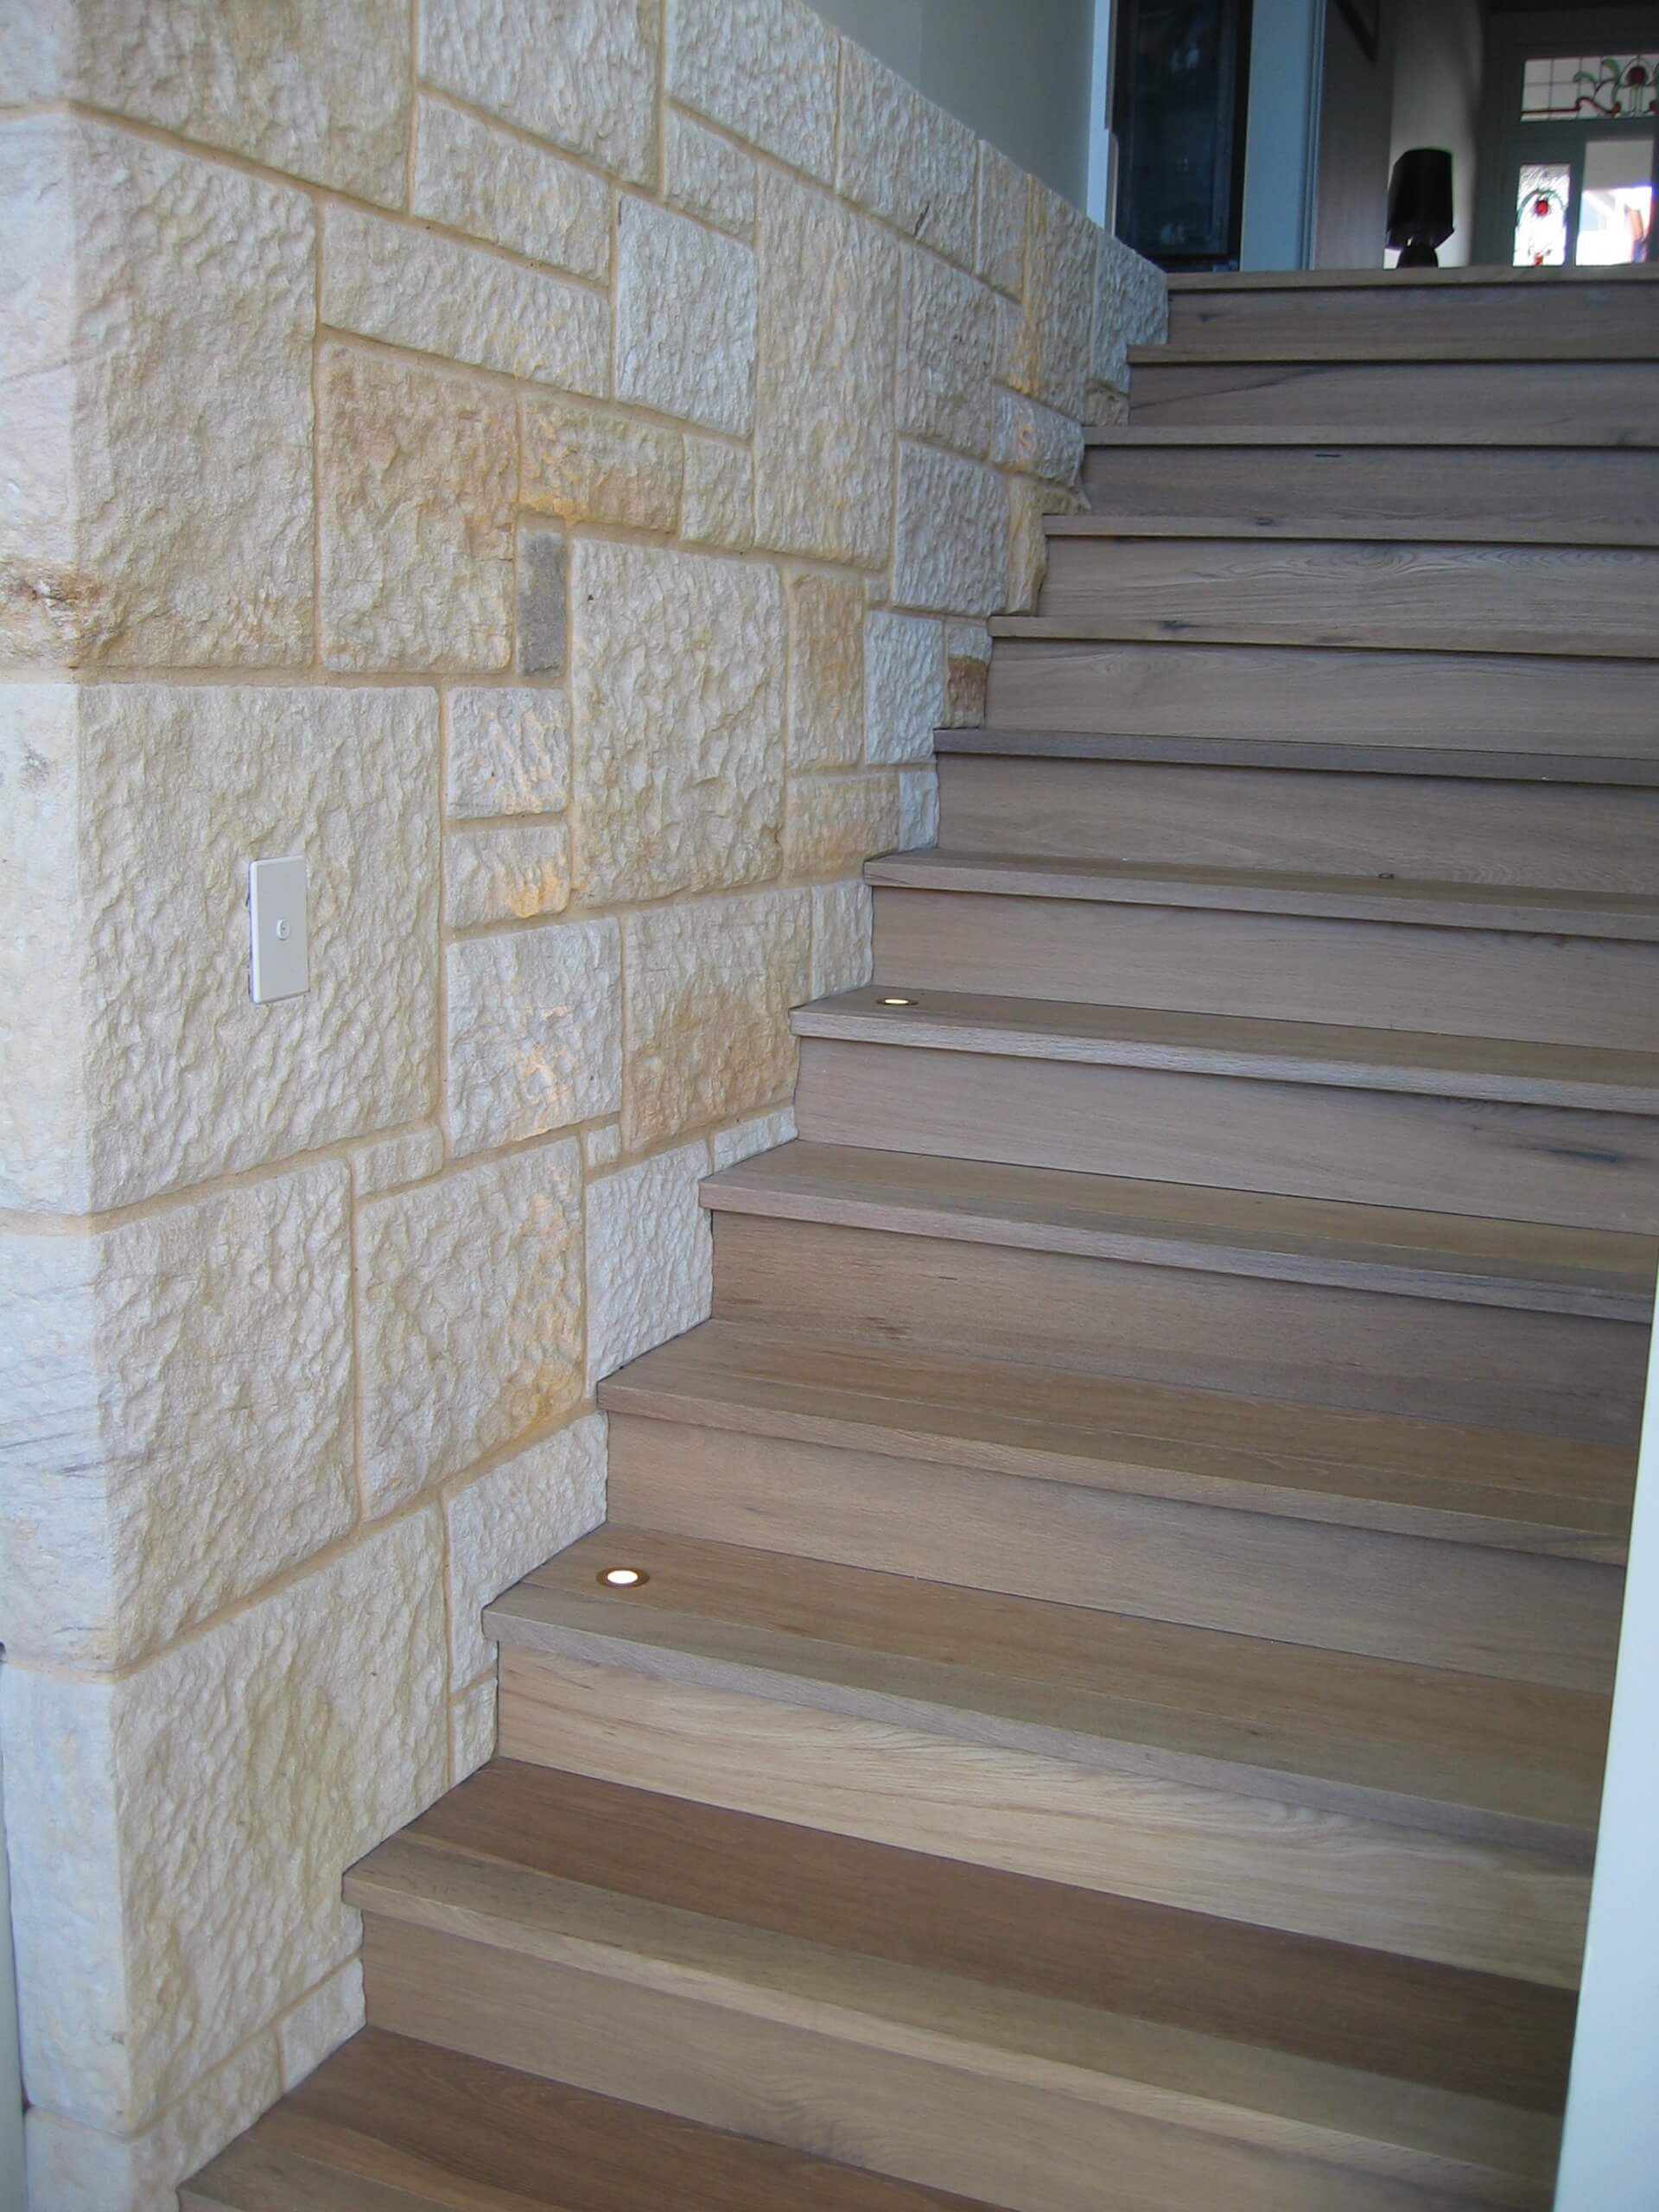 6. Hallway Stair